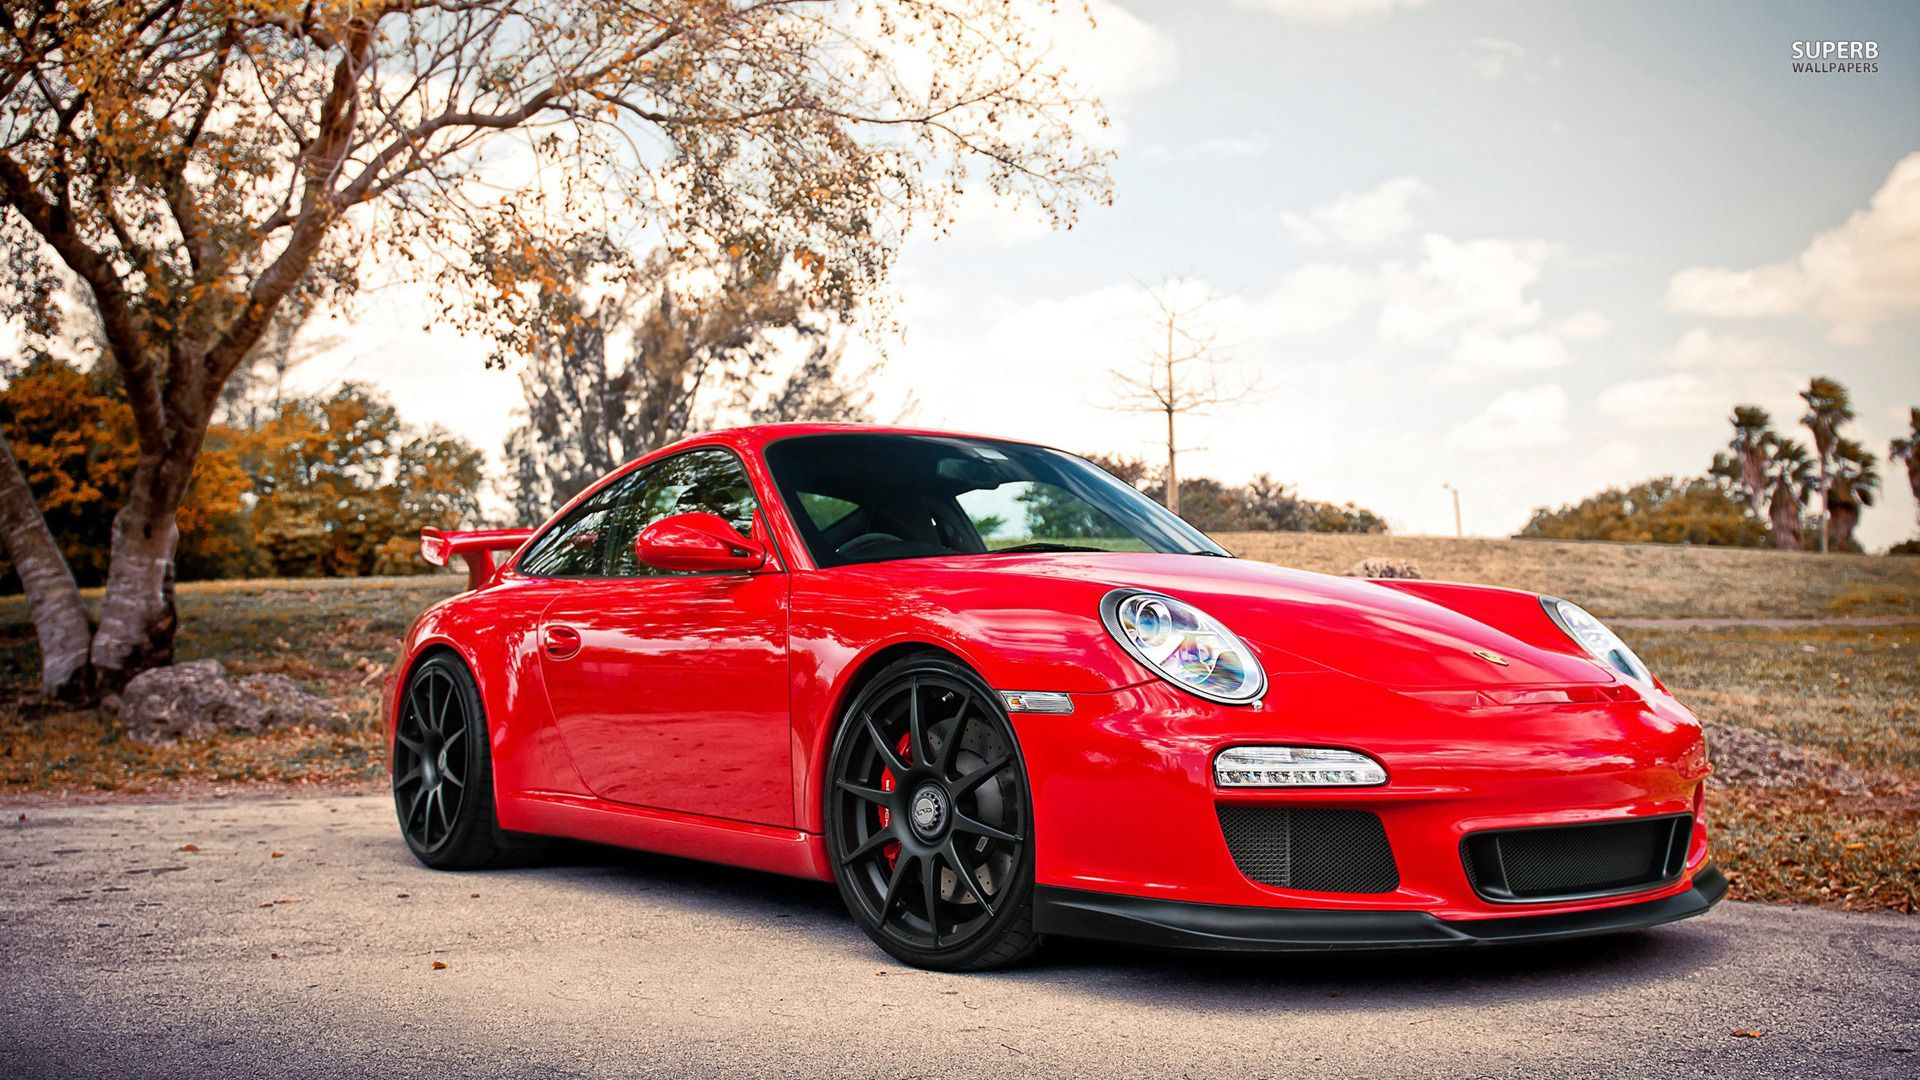 Porsche 911 Porsche Gt3 Porsche Cars Porsche 911 Gt3